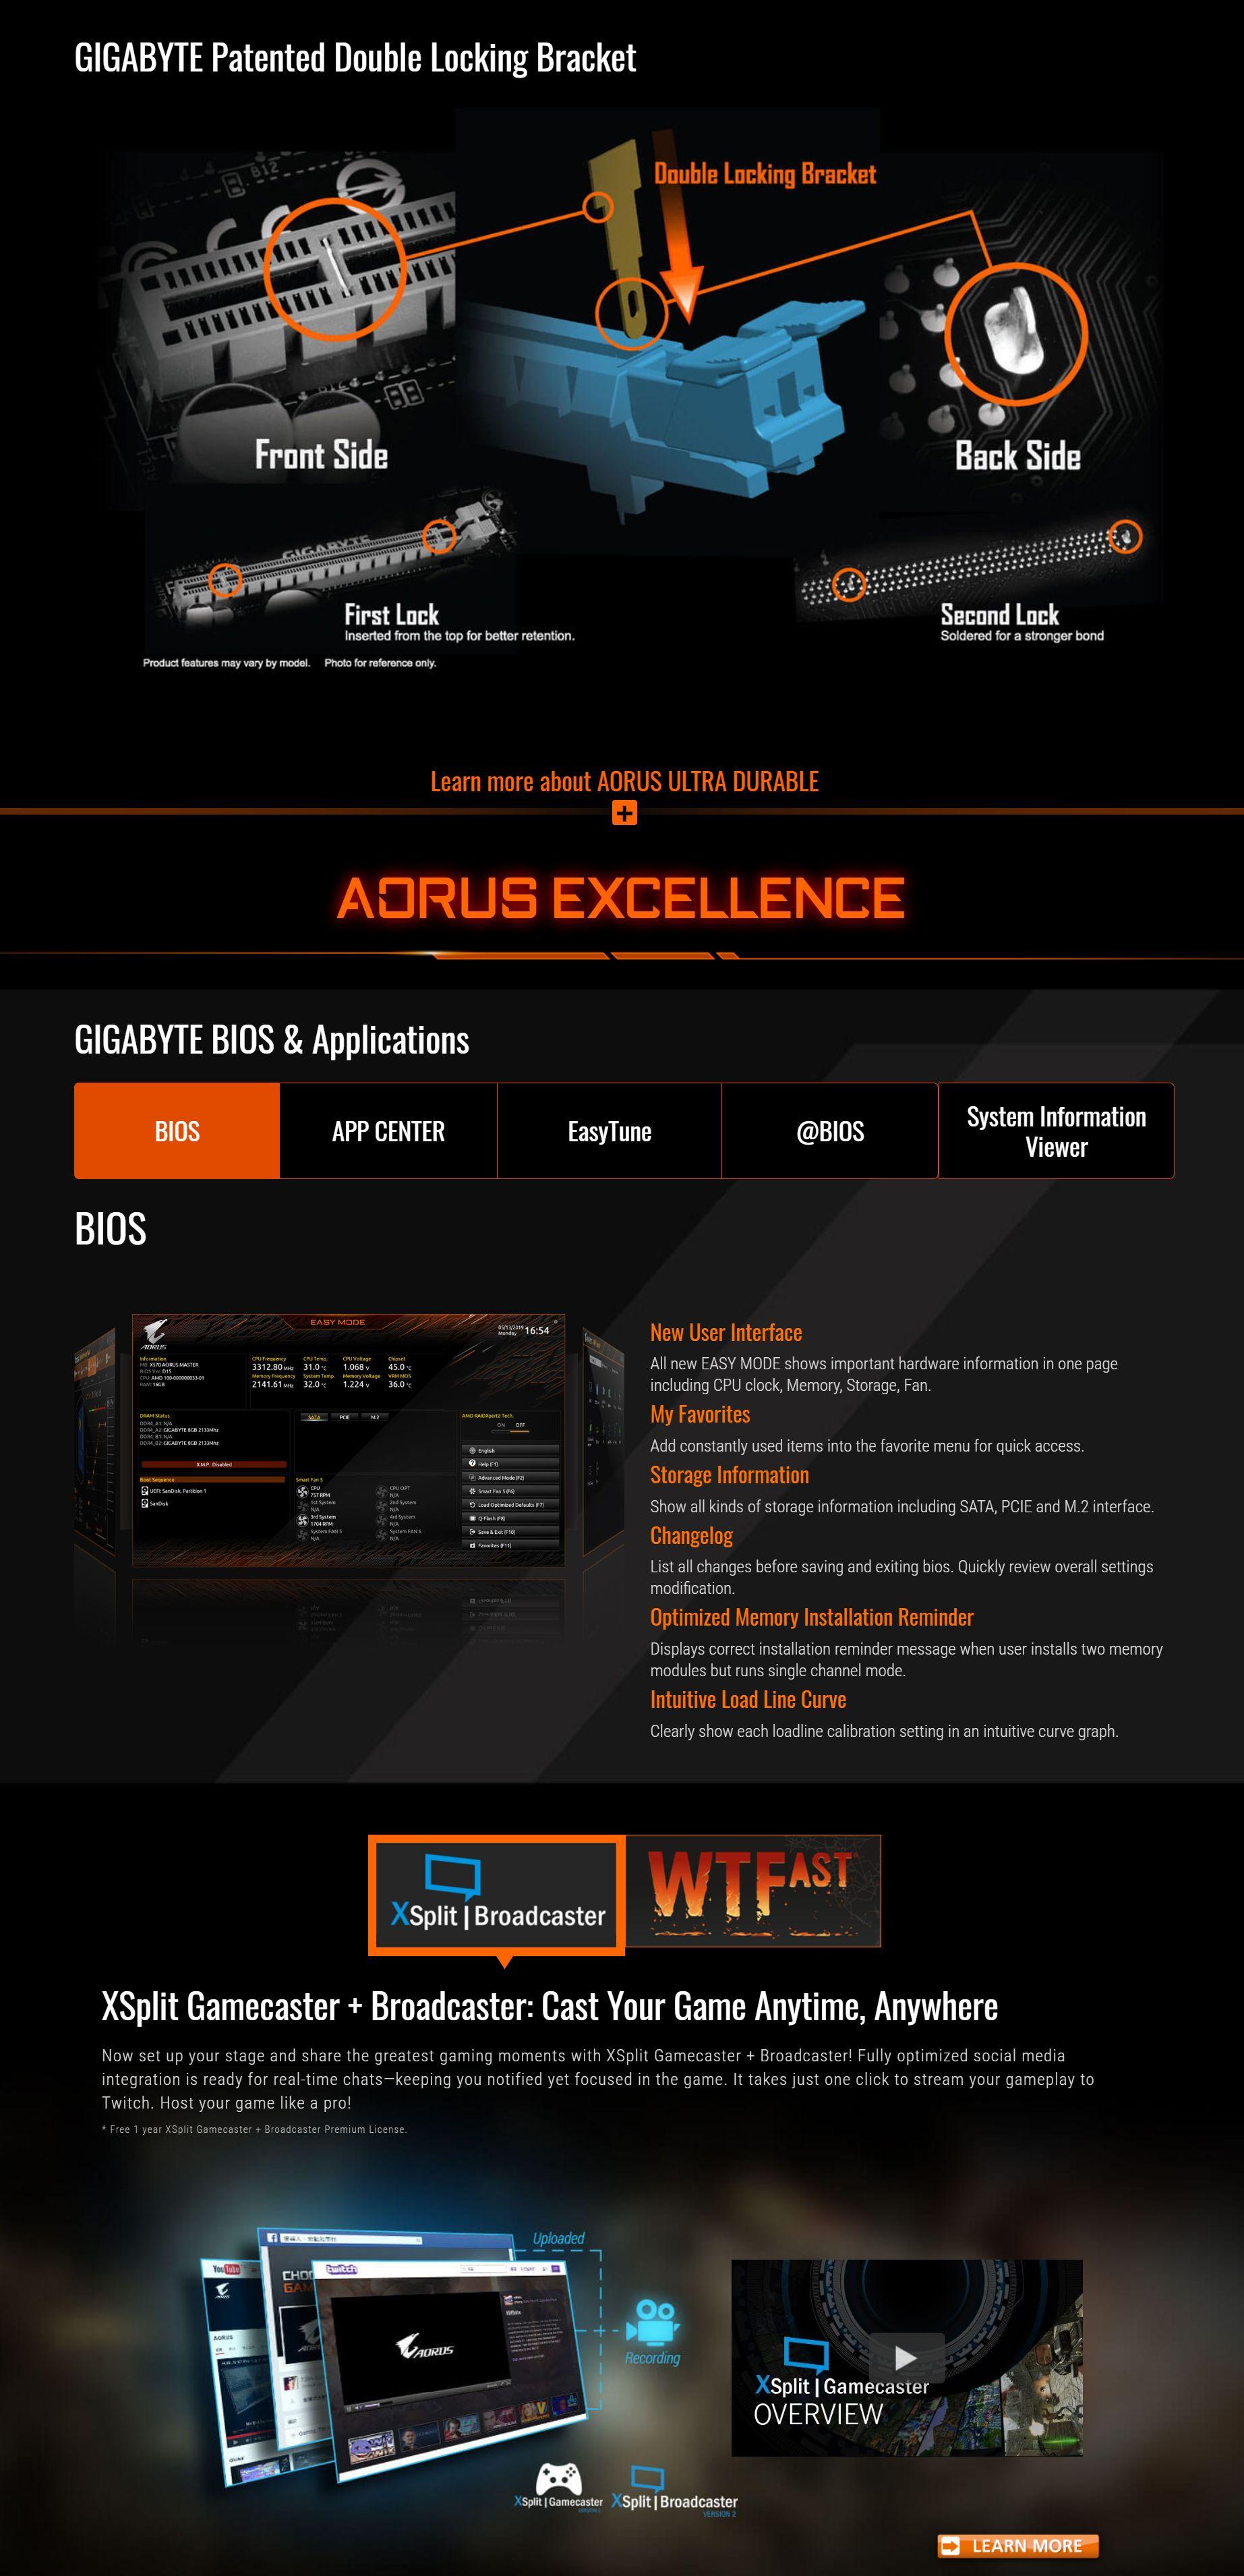 Gigabyte X570I Aorus Pro WiFi AM4 ITX Motherboard